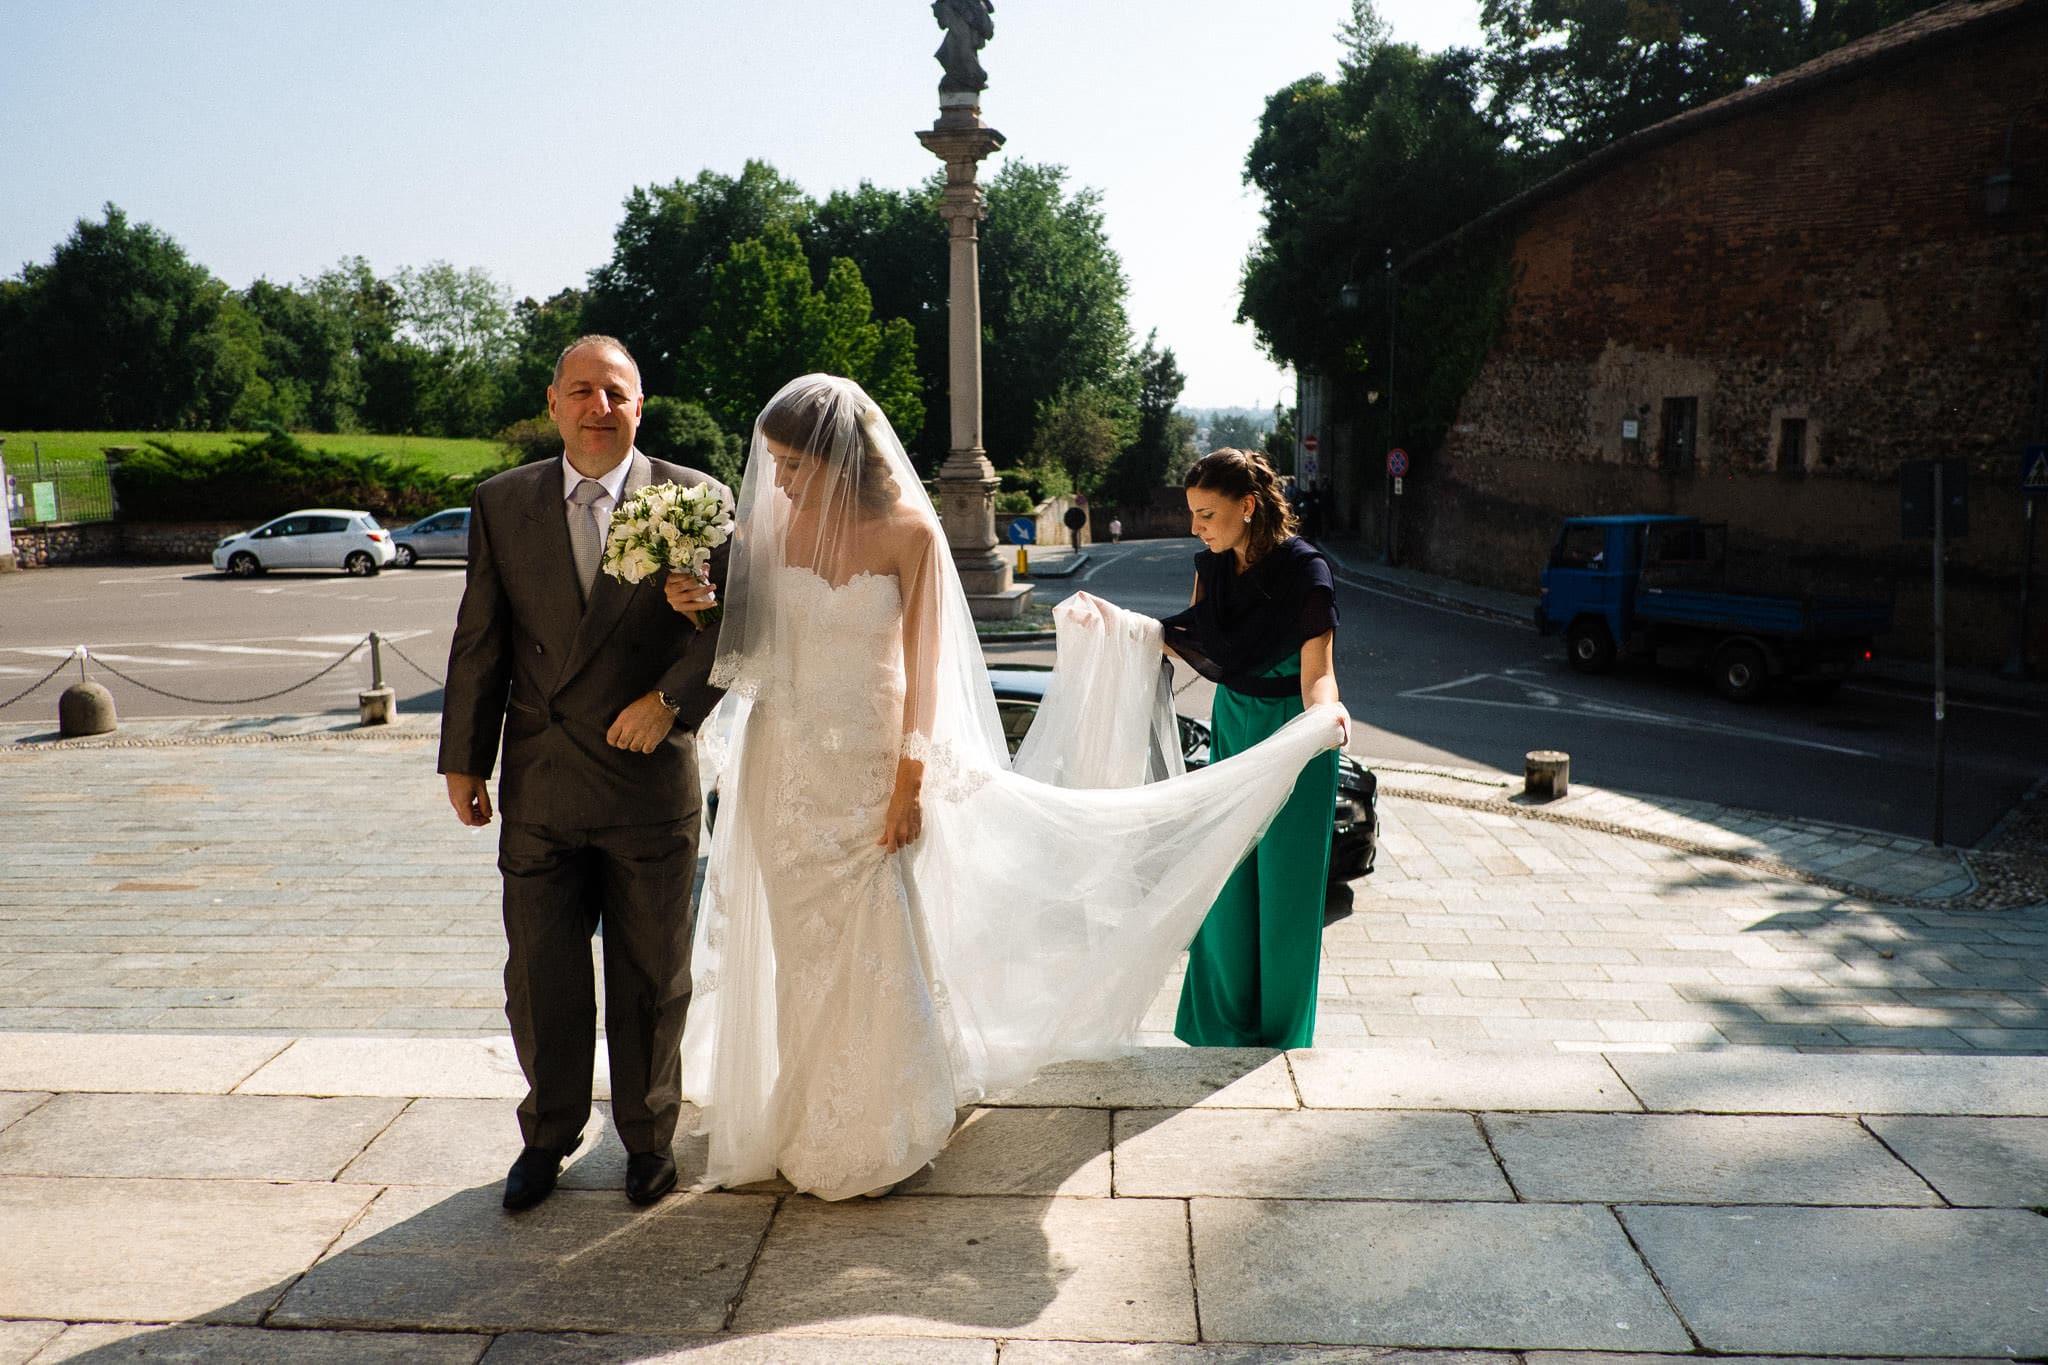 fotografo matrimonio cascina diodona varese lucarossifoto 00008